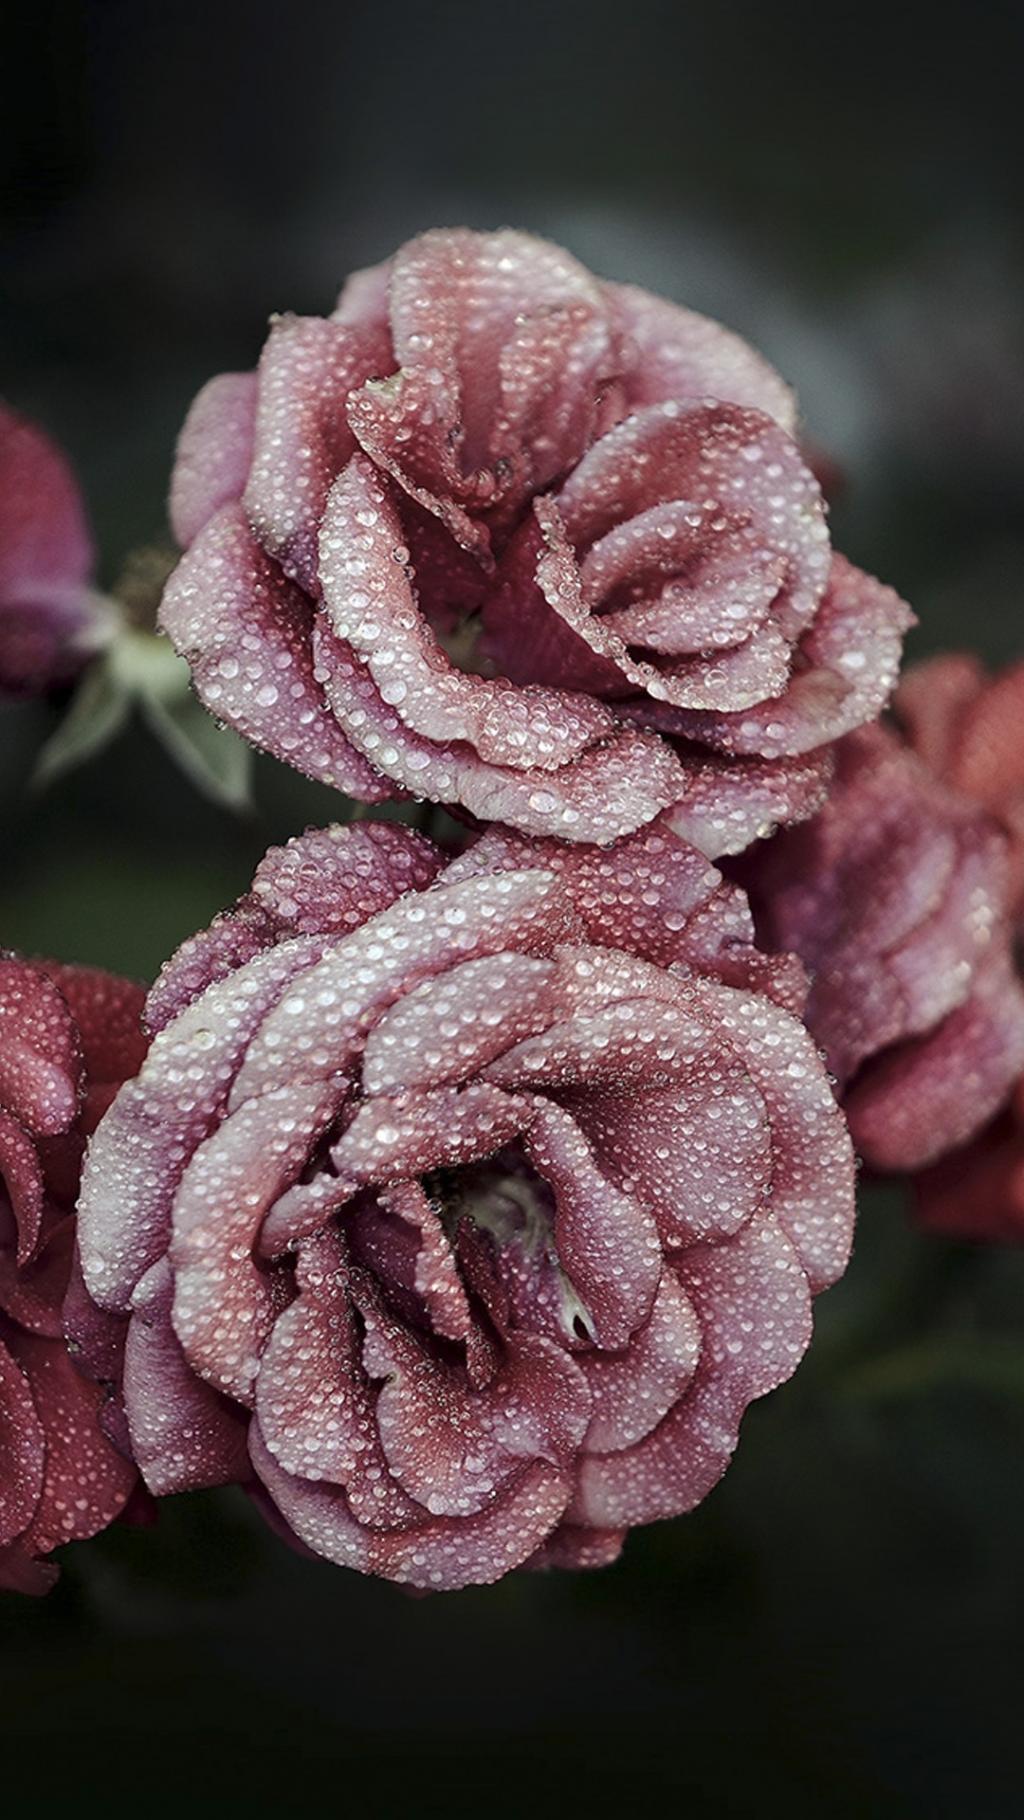 Cute Wallpapers Flower 错过的玫瑰花香 锁屏图片 高清手机壁纸 风景 回车桌面